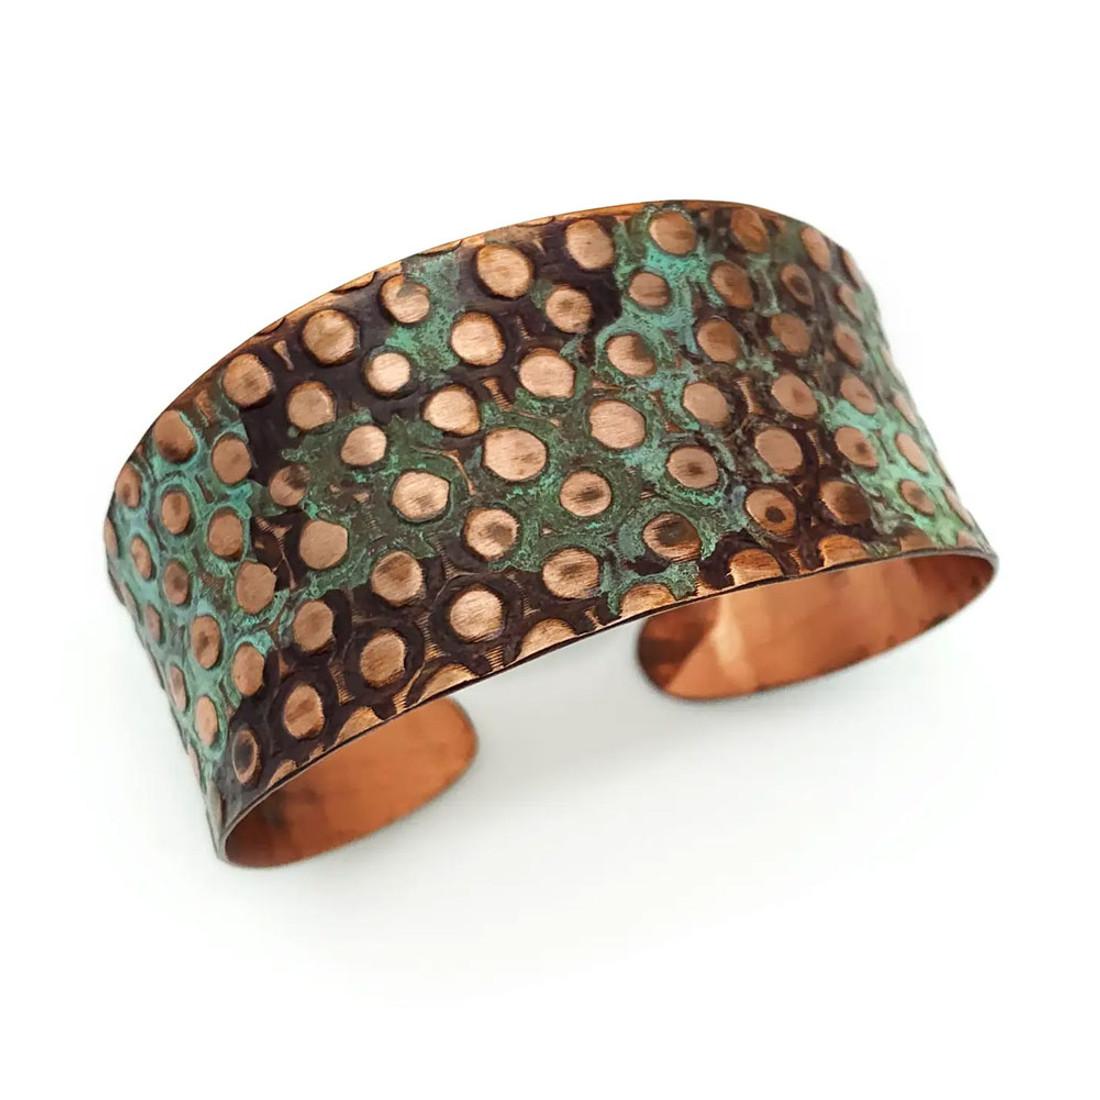 Copper and Teal Rivets Cuff Bracelet